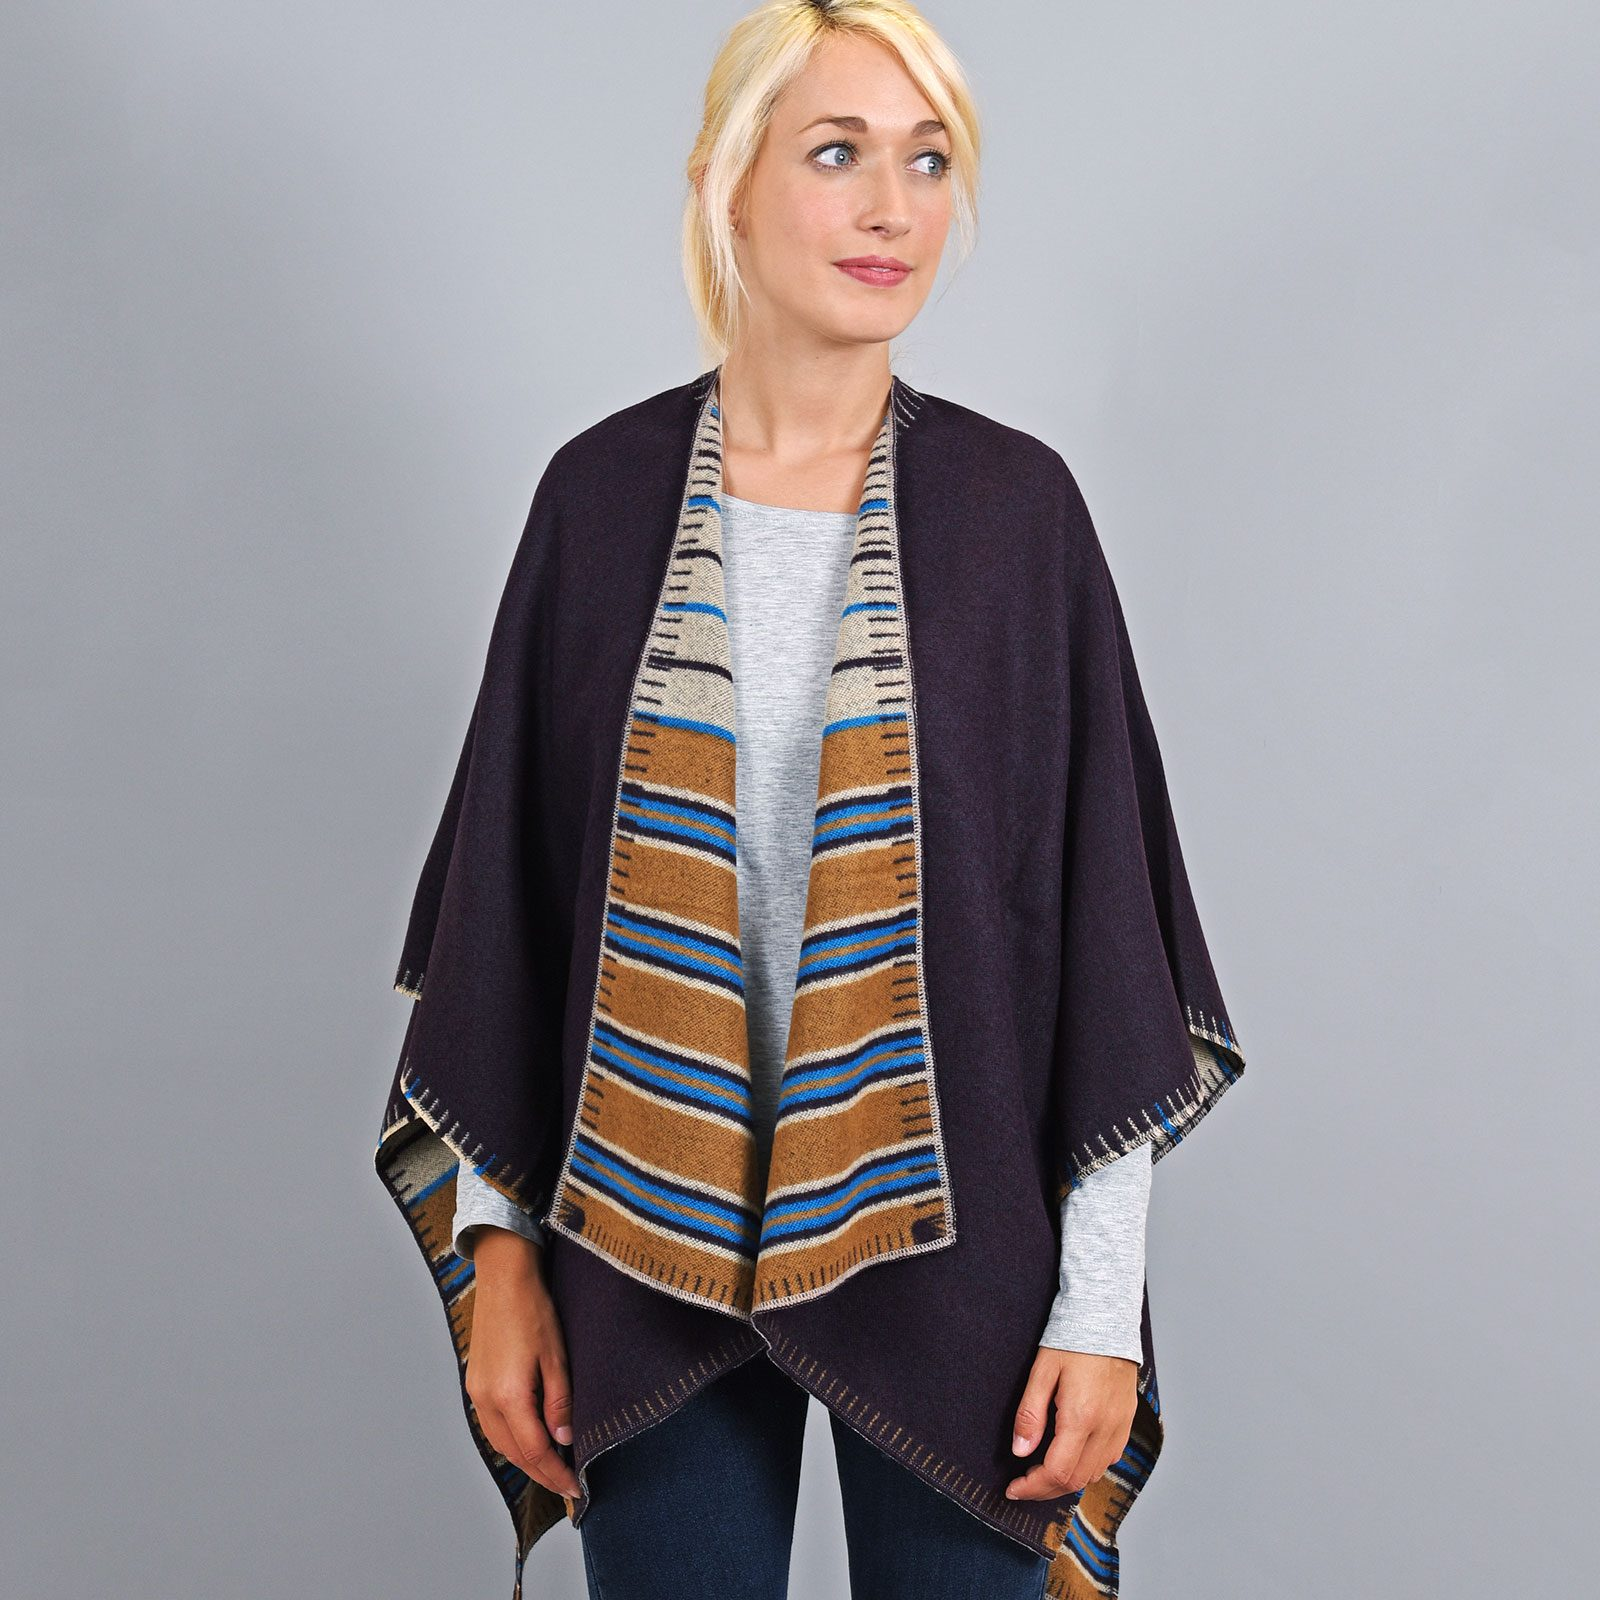 http://lookbook.allee-du-foulard.fr/wp-content/uploads/2019/01/AT-03193-VF16-2-poncho-femme-reversible-taupe-fabrication-france-1600x1600.jpg